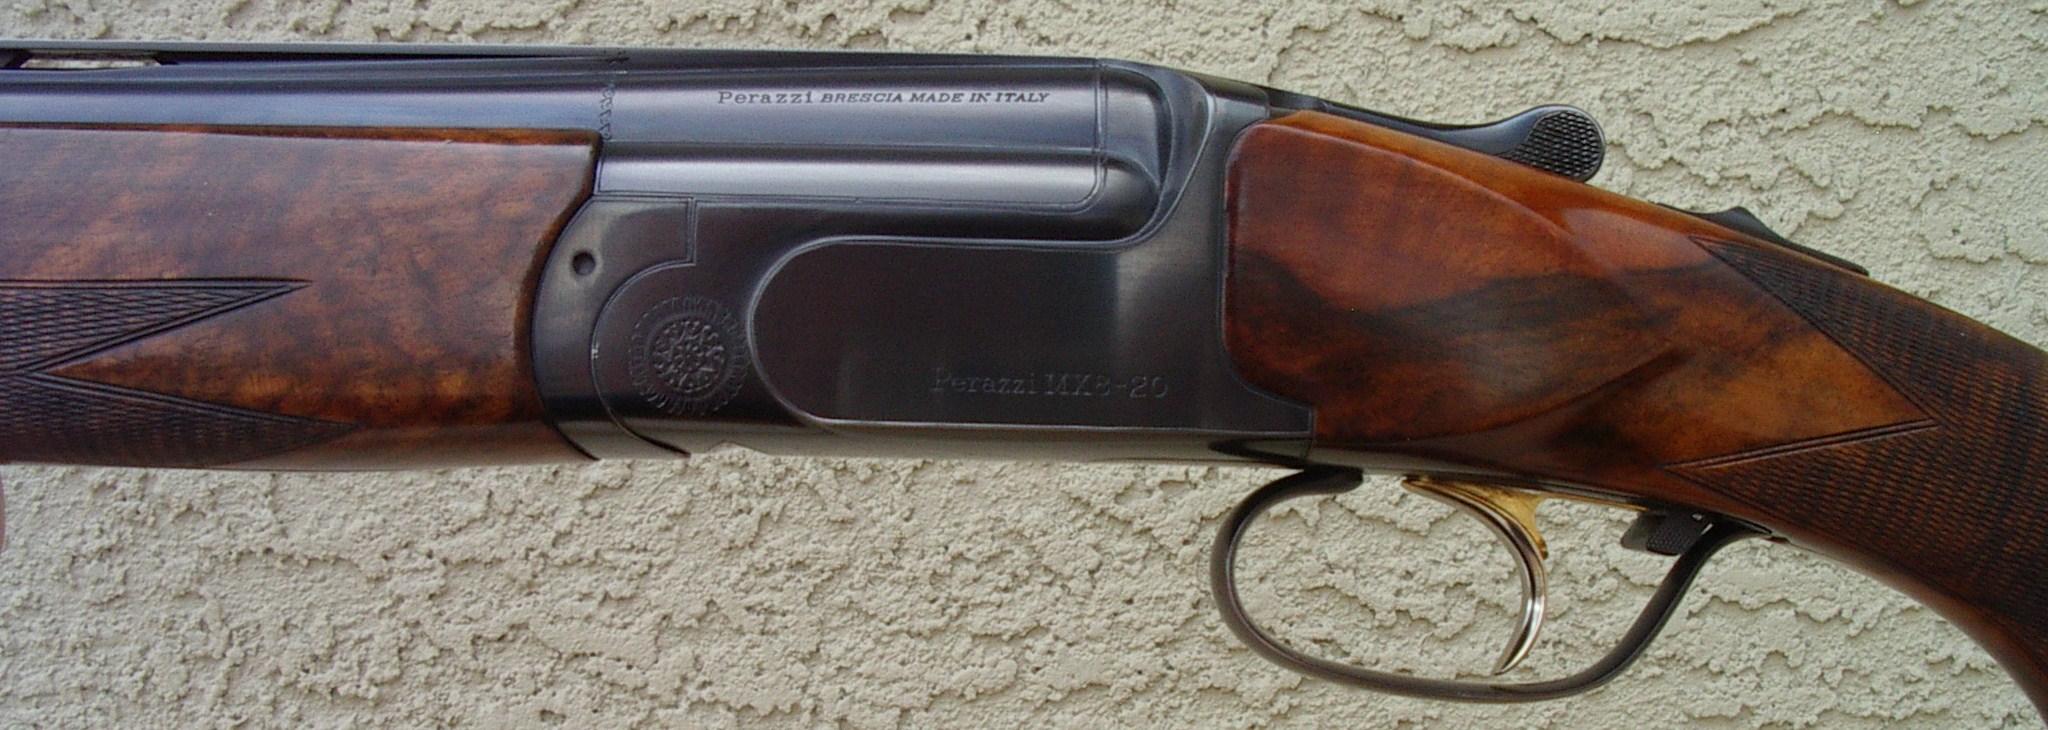 MX8 20 Ext Sel Trigger 003.JPG